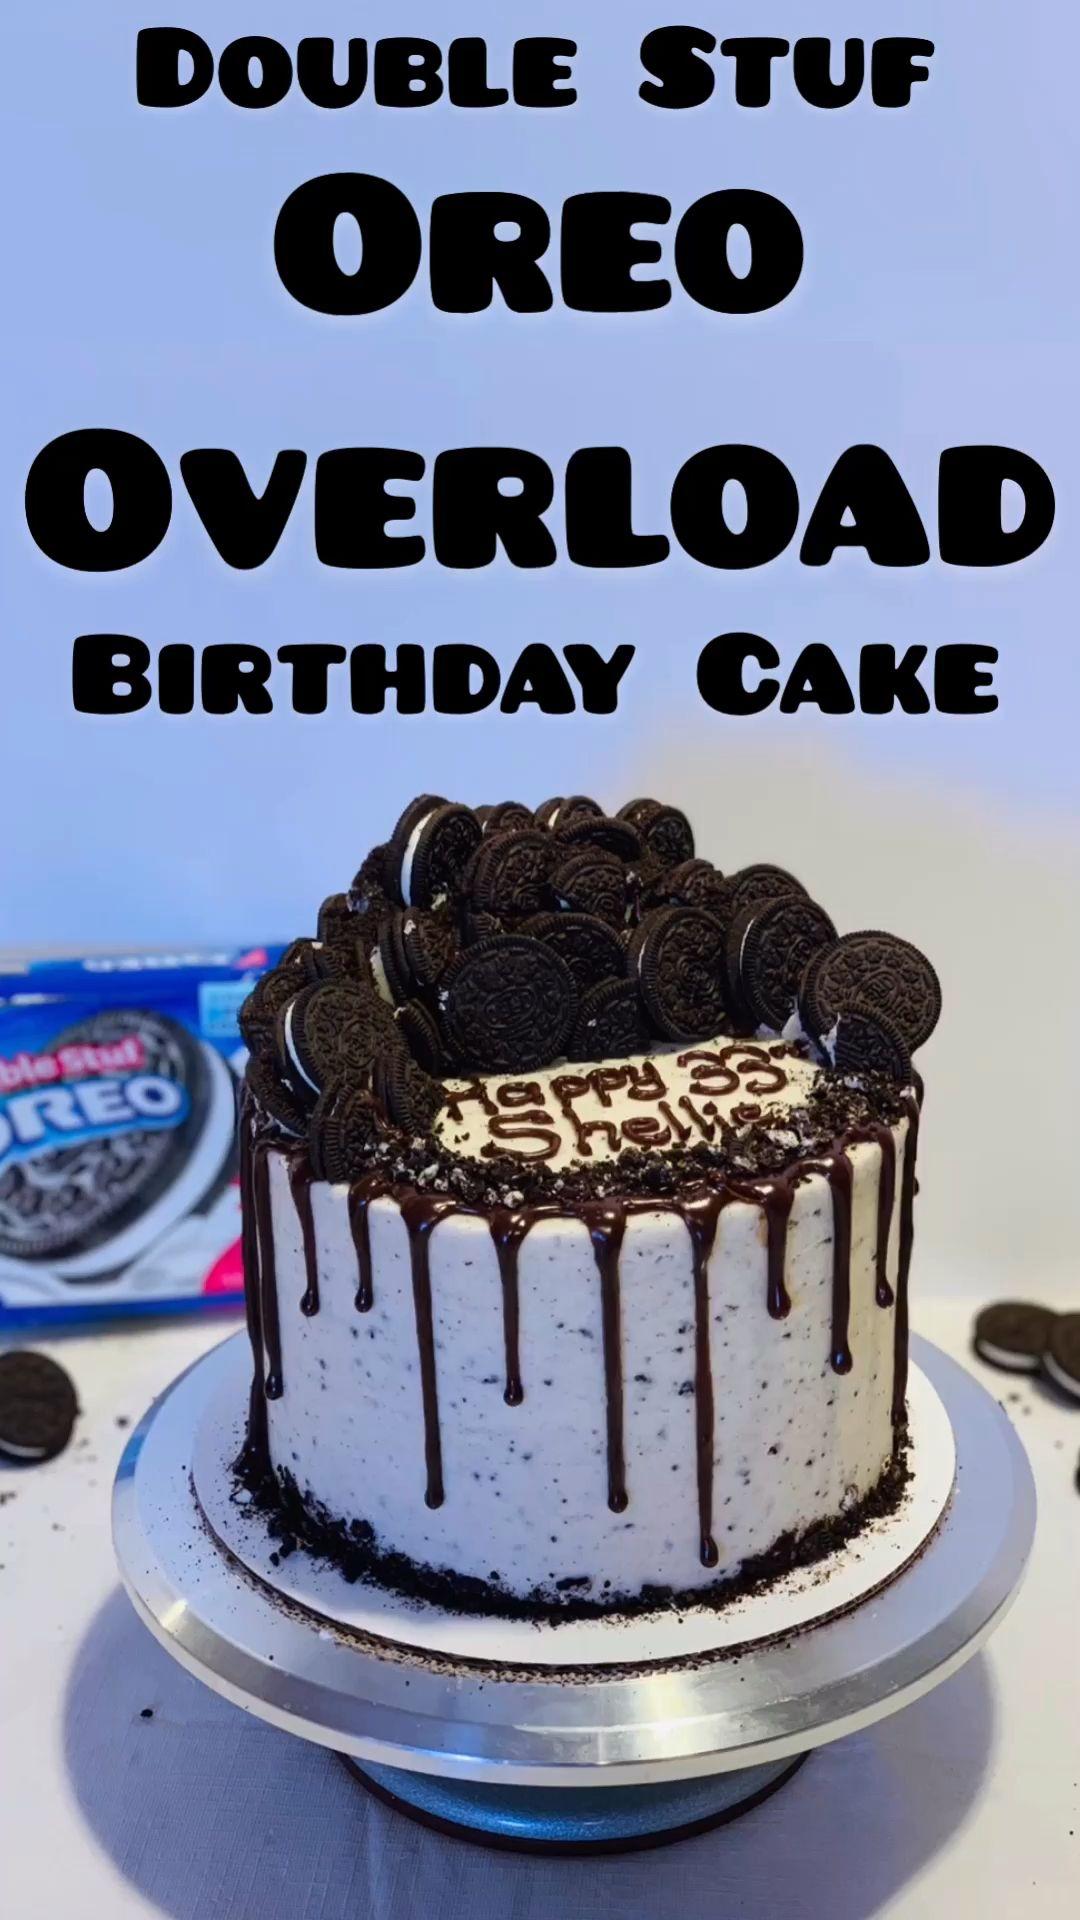 Peachy Oreo Overload Cake Video Video With Videos Oreo Cake Funny Birthday Cards Online Kookostrdamsfinfo